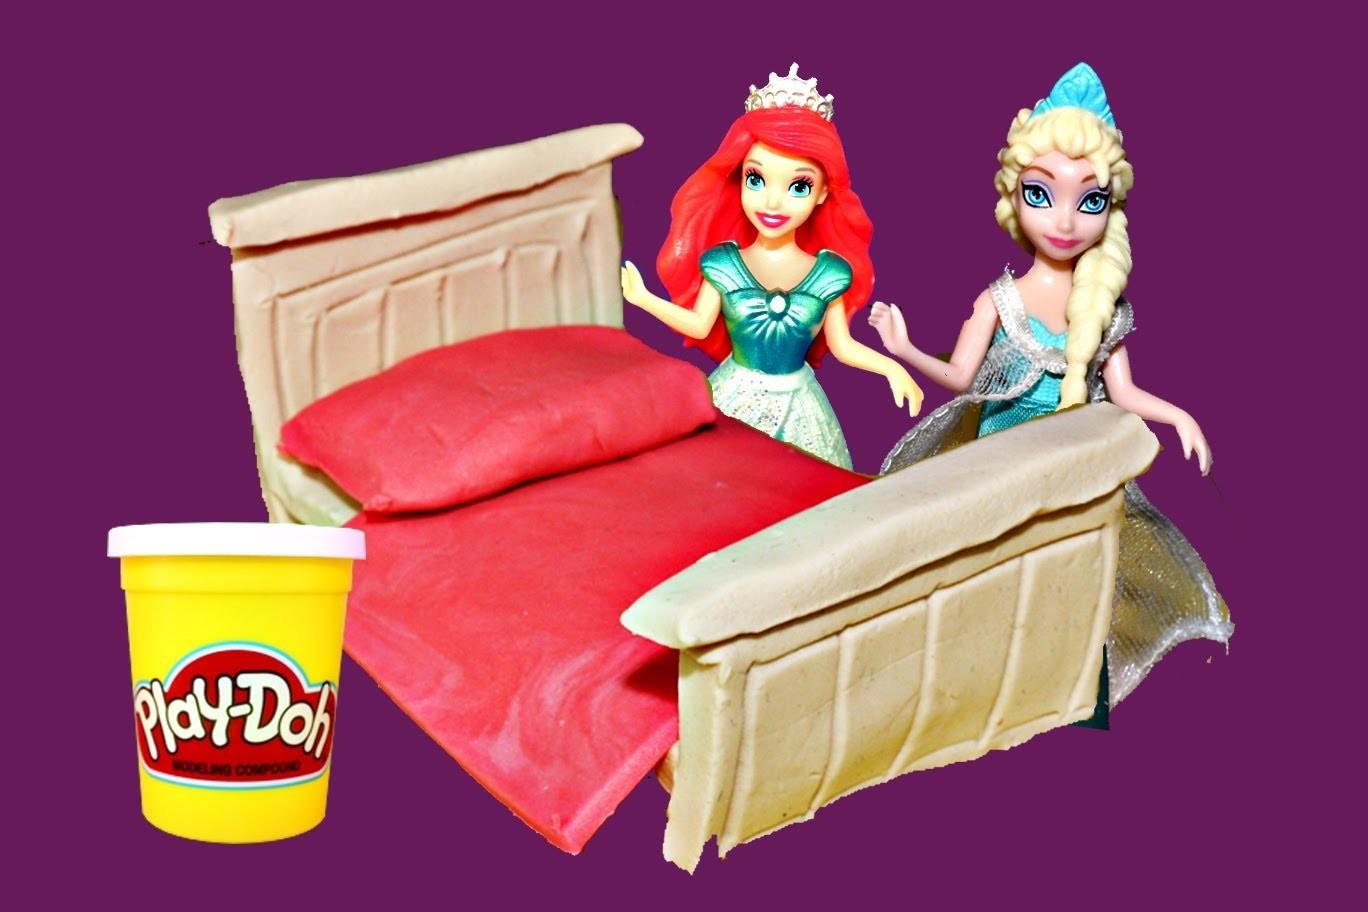 Play Doh Doll Bed Tutorial Elsa, Little Mermaid Ariel and Disney Frozen Princess Anna DisneyCarToys